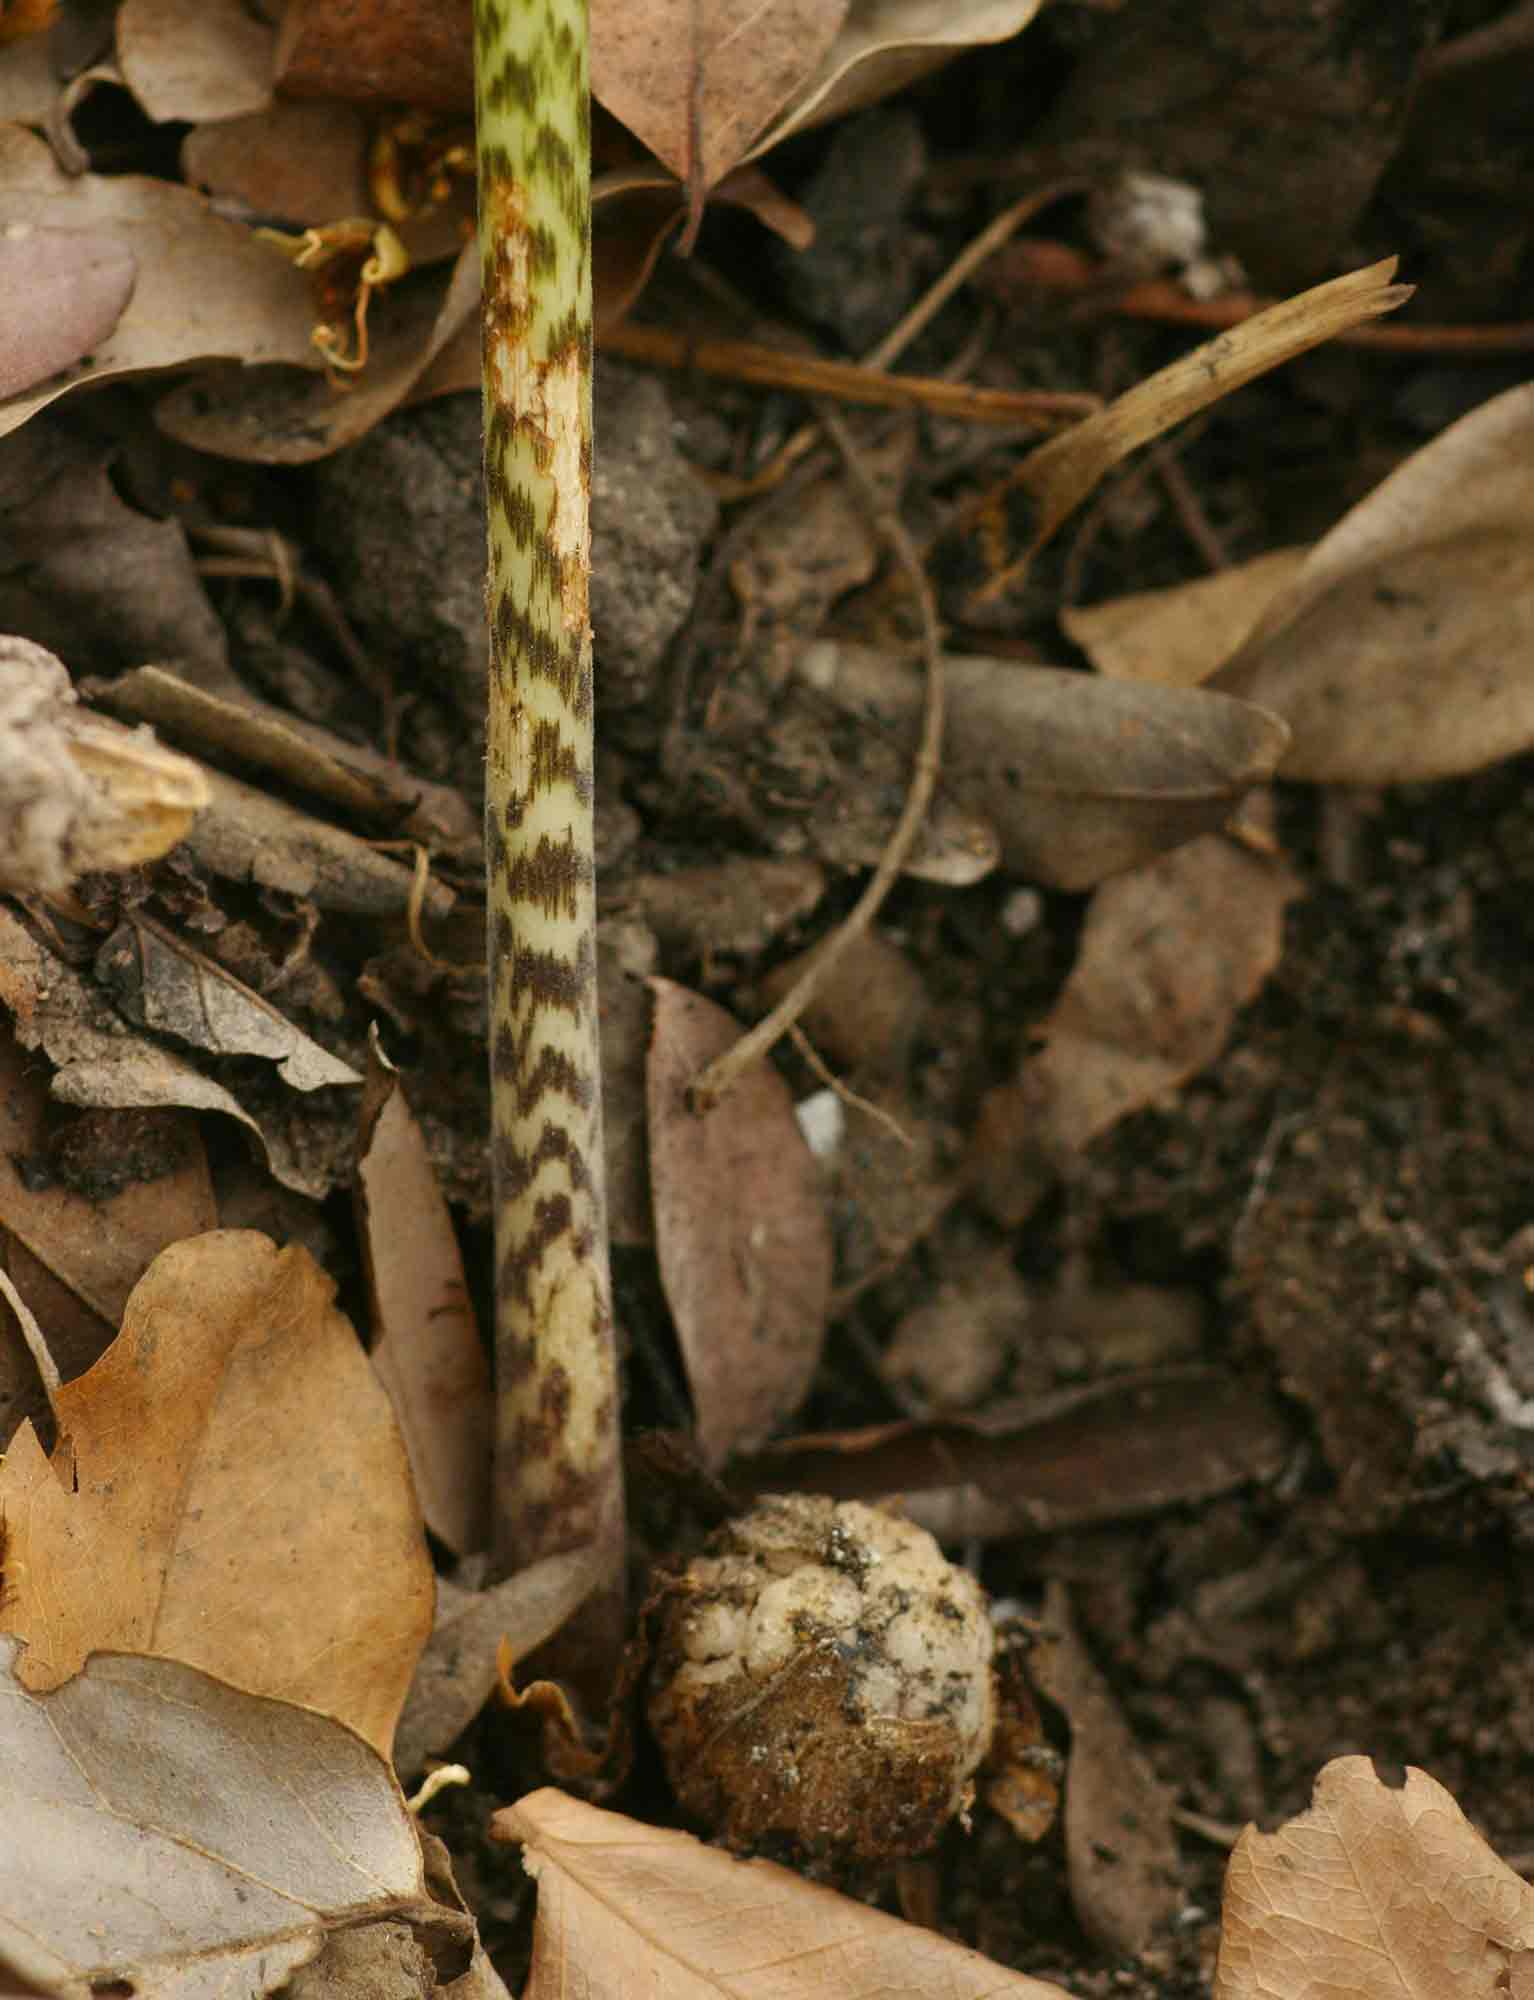 Stylochaeton puberulus